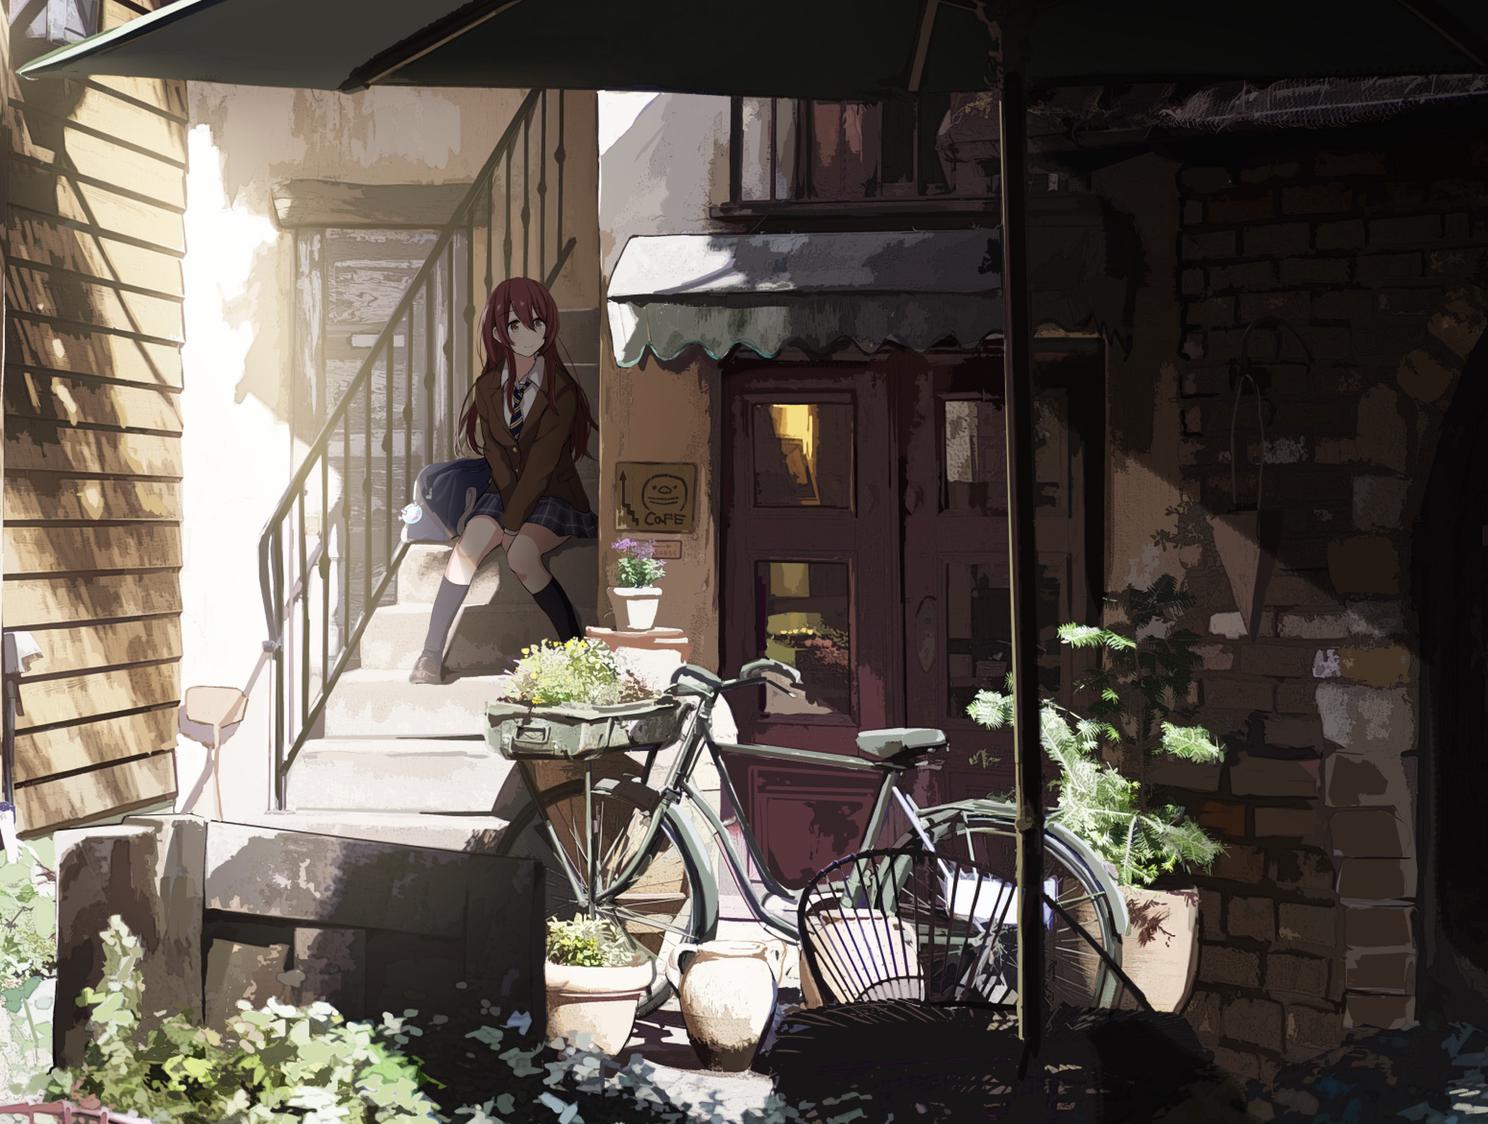 bicycle idolmaster idolmaster_shiny_colors kneehighs oosaki_tenka sakeharasu scenic school_uniform shade stairs summer